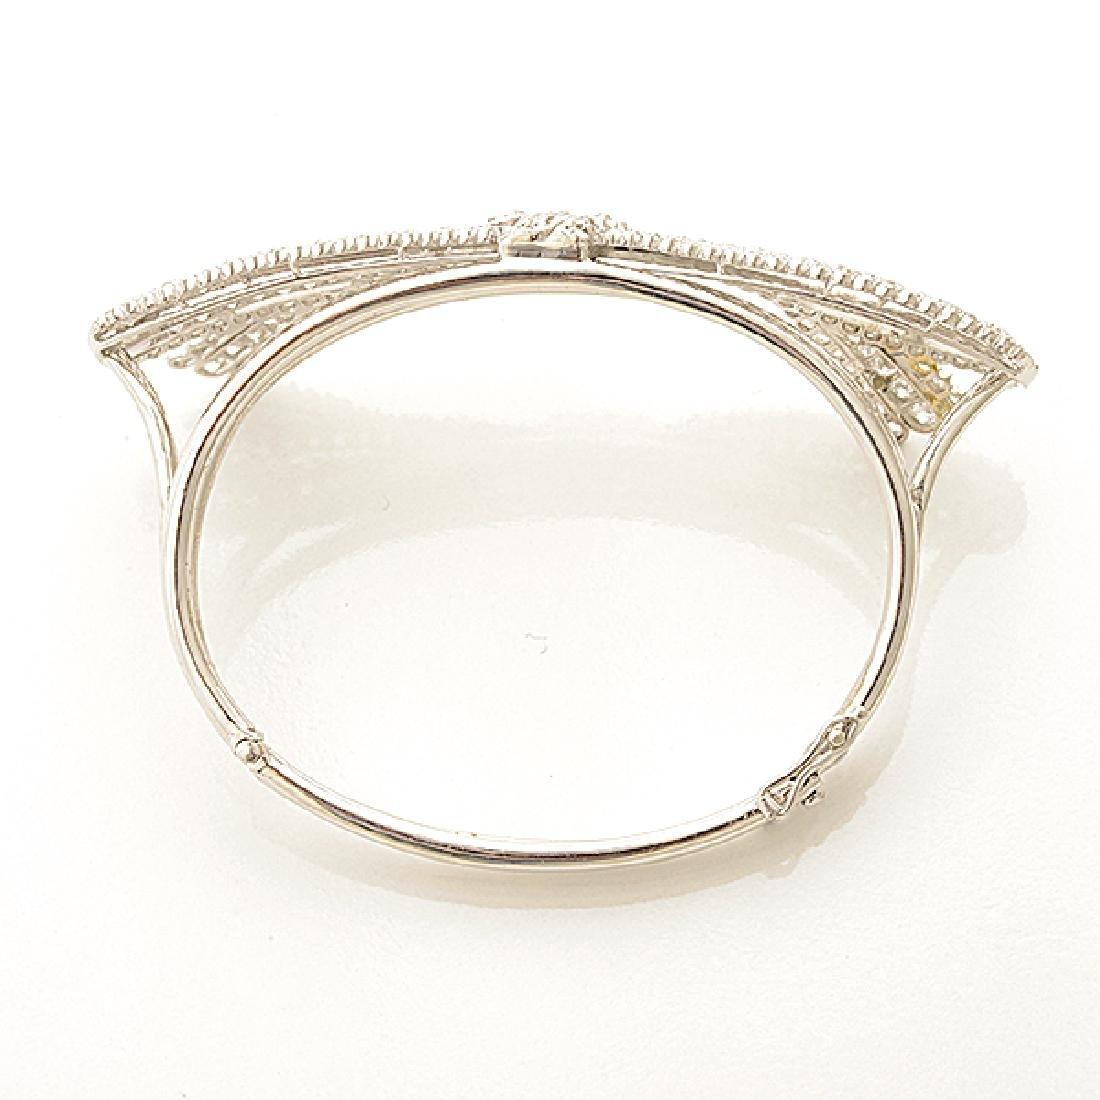 Diamond, Platinum Bow Bracelet. - 3